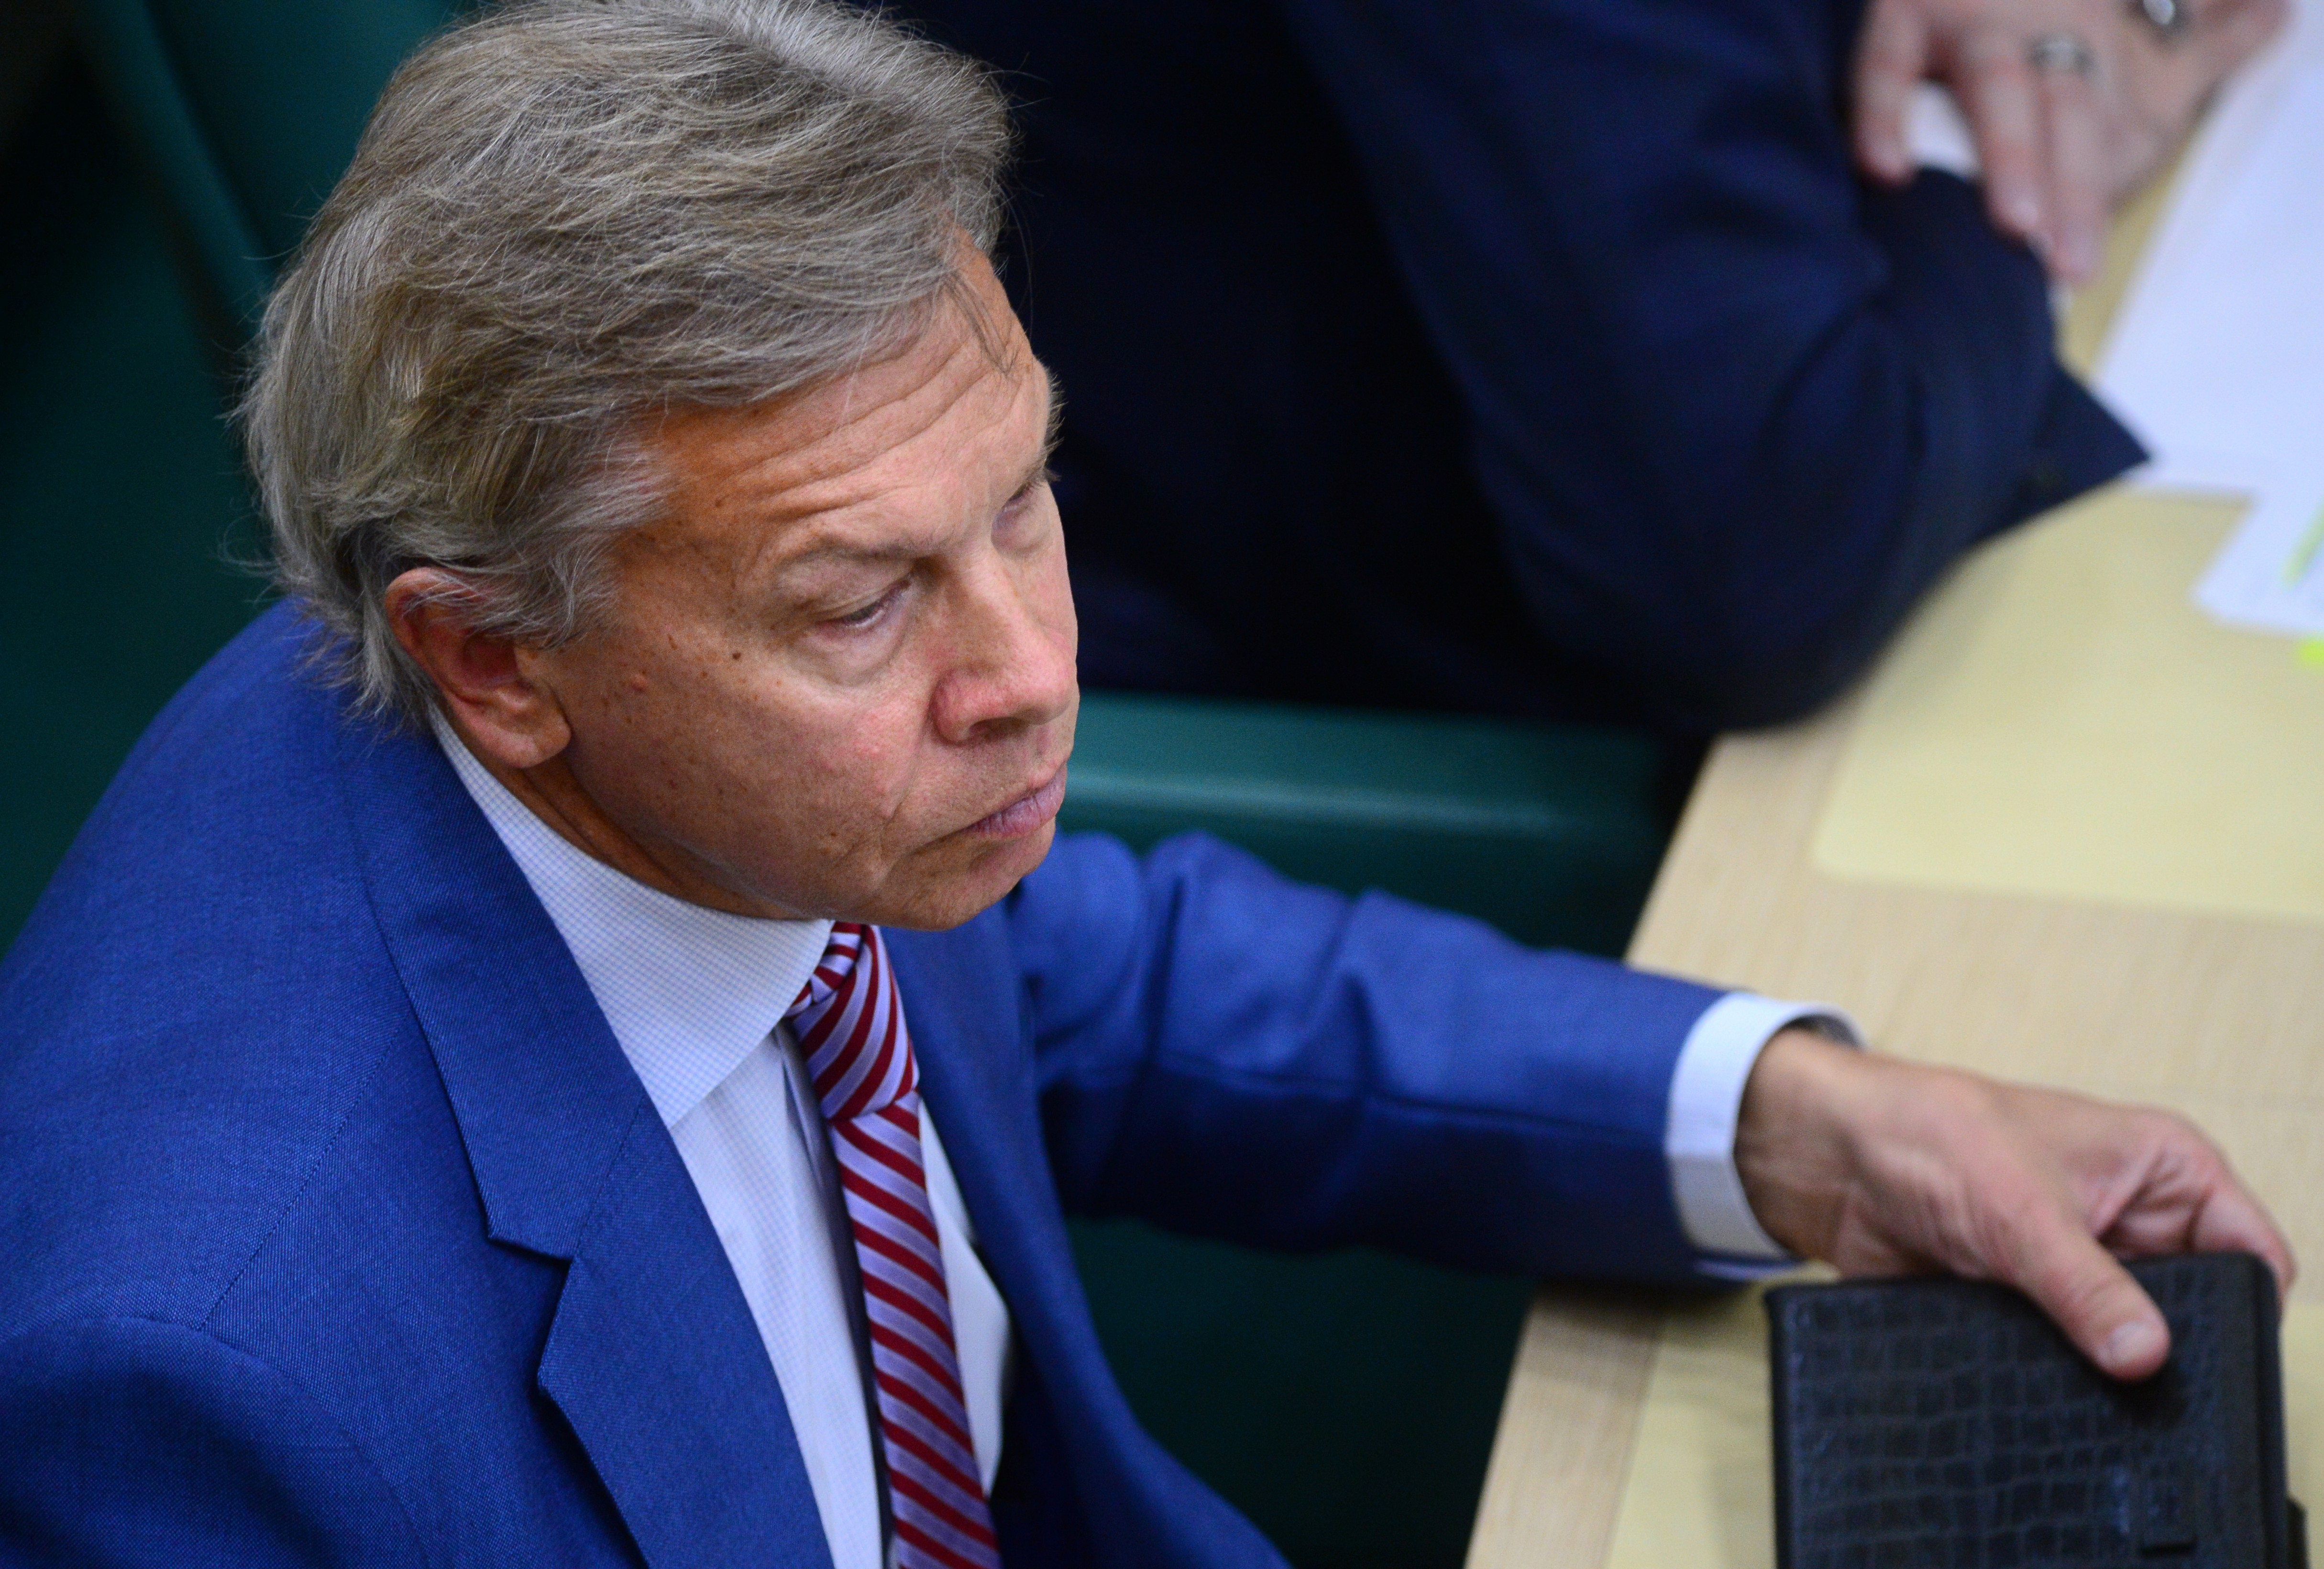 <p>Сенатор Алексей Пушков. Фото: &copy; РИА Новости/Кирилл Каллиников</p>